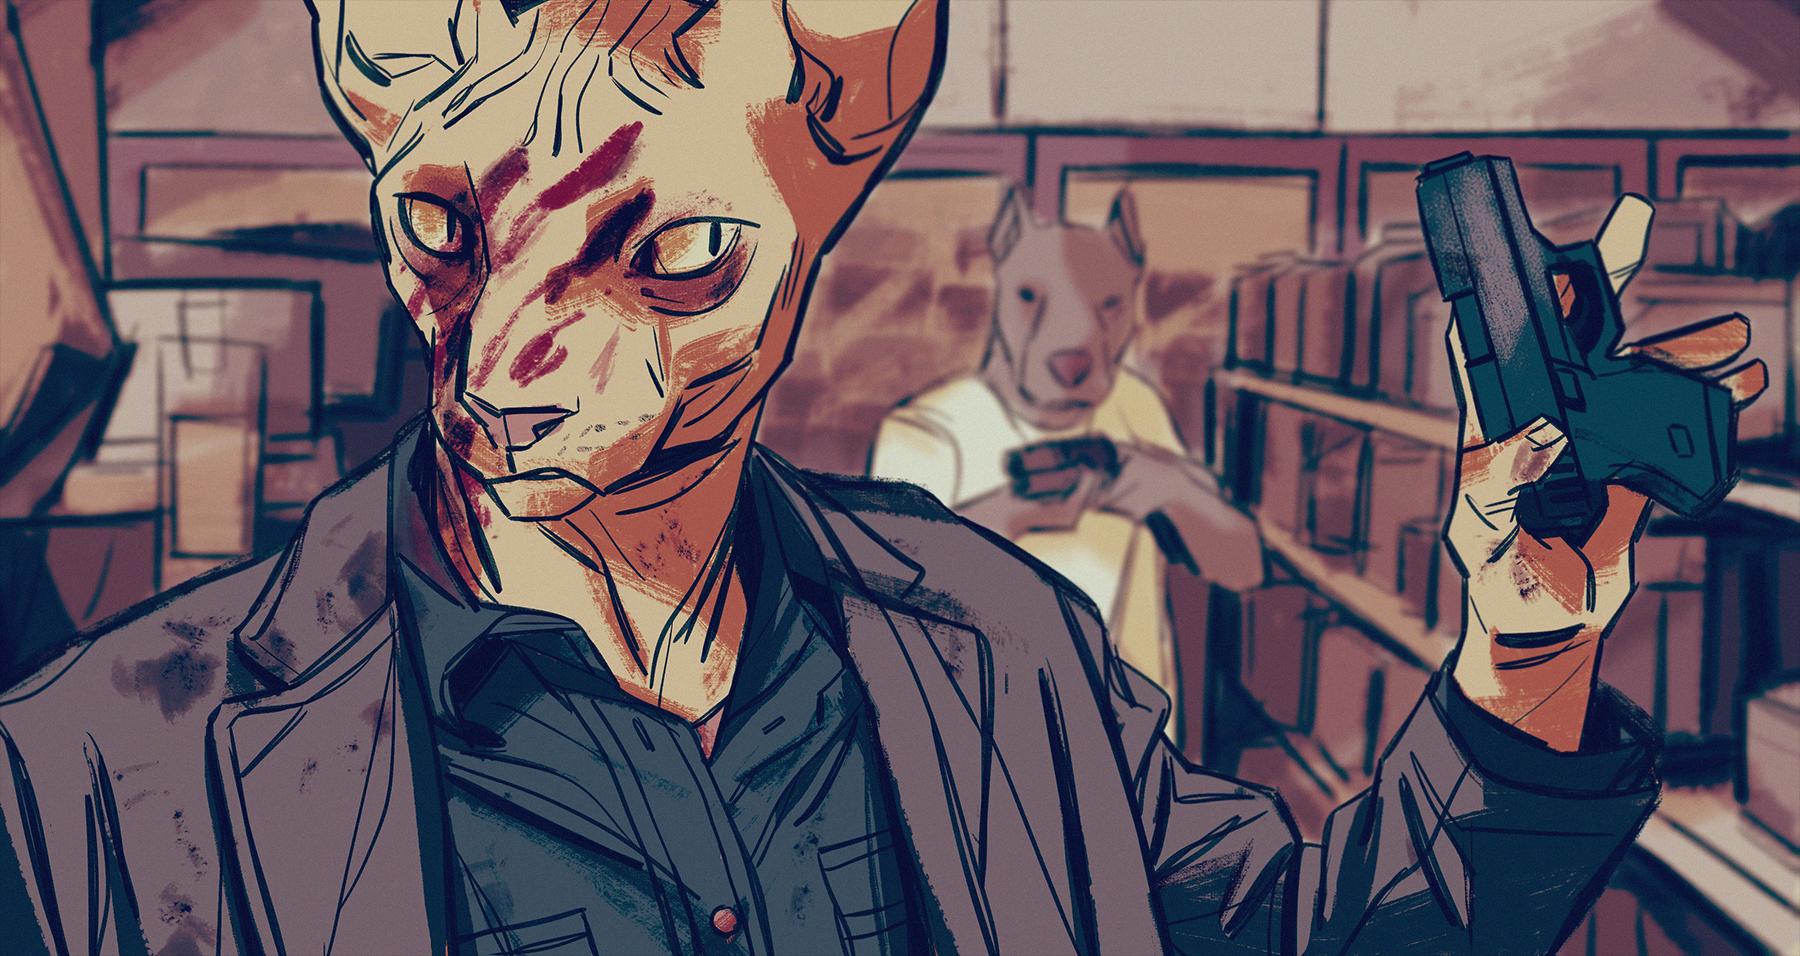 Wallpaper Gambar Ilustrasi Kucing Anjing Darah Anthro